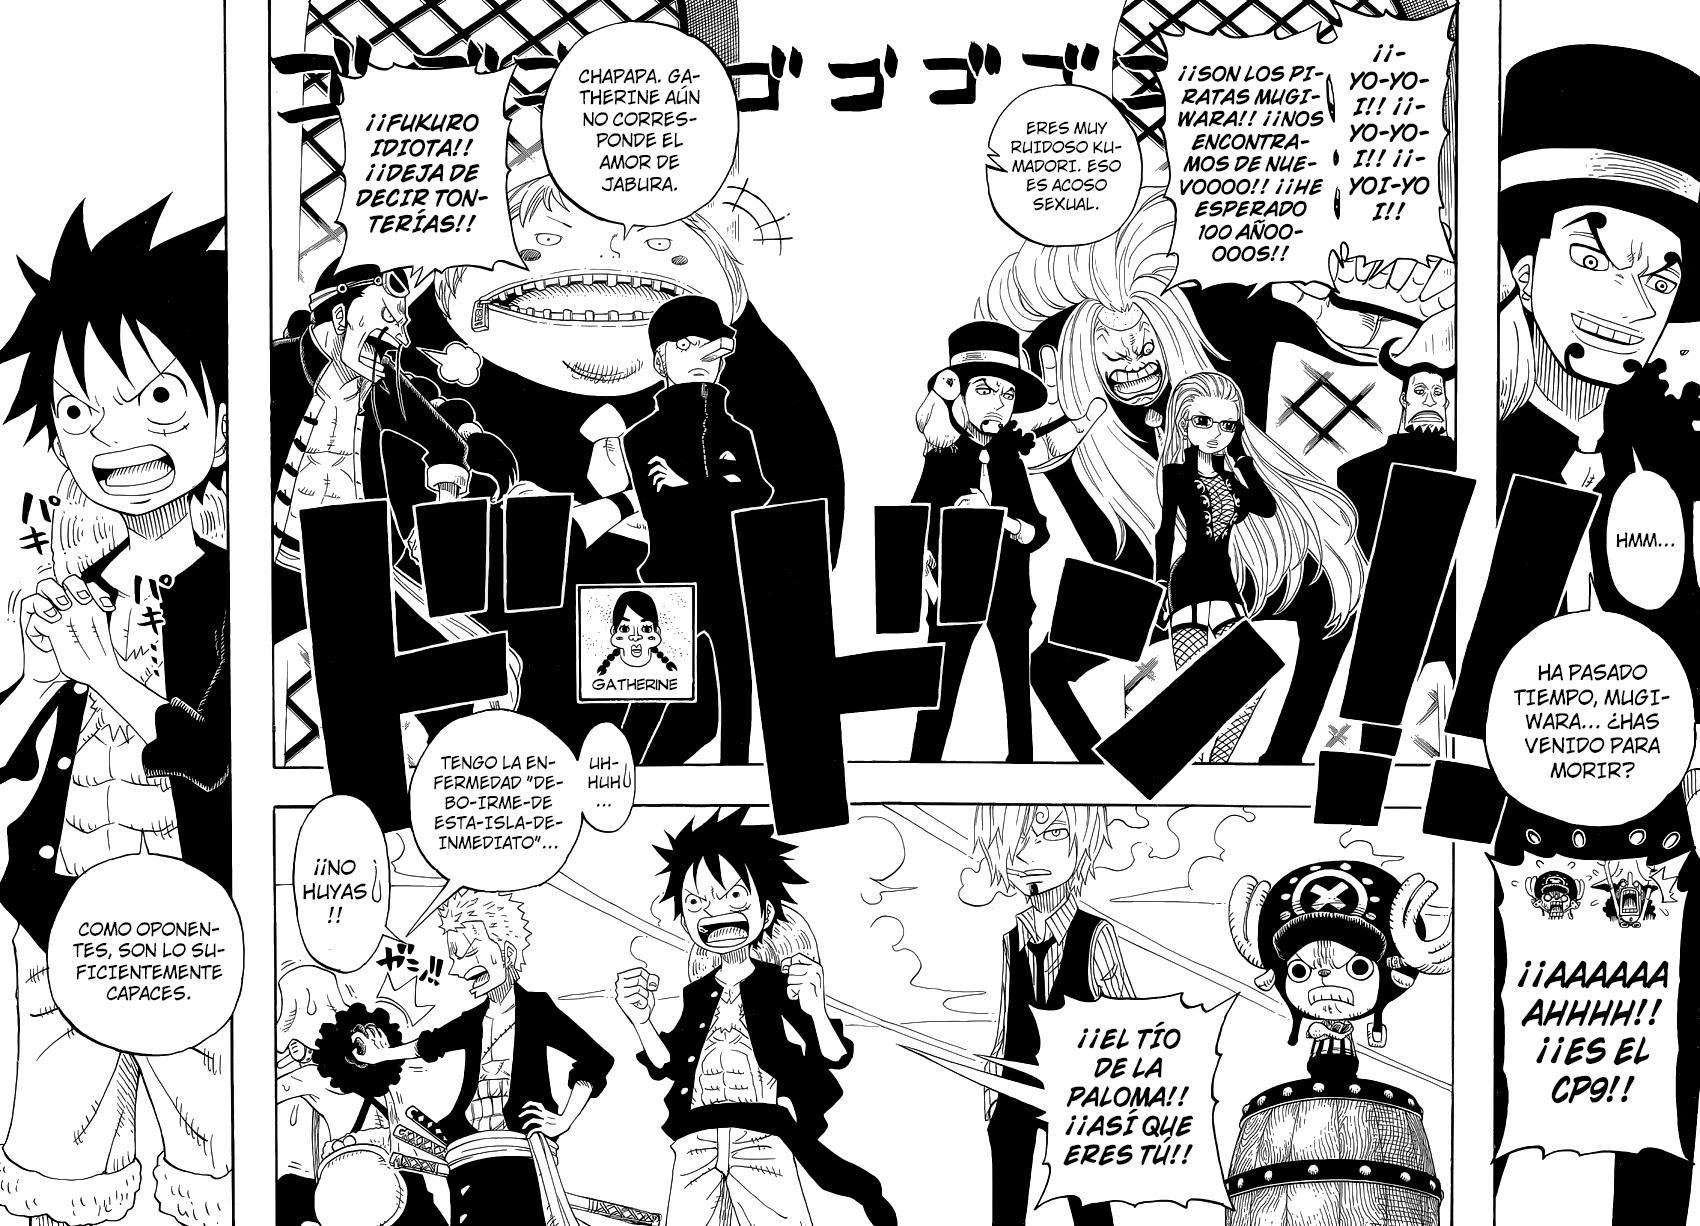 http://c5.ninemanga.com/es_manga/50/114/355344/0ca17a7c1e78d848cea4f4d00e60b9cc.jpg Page 10